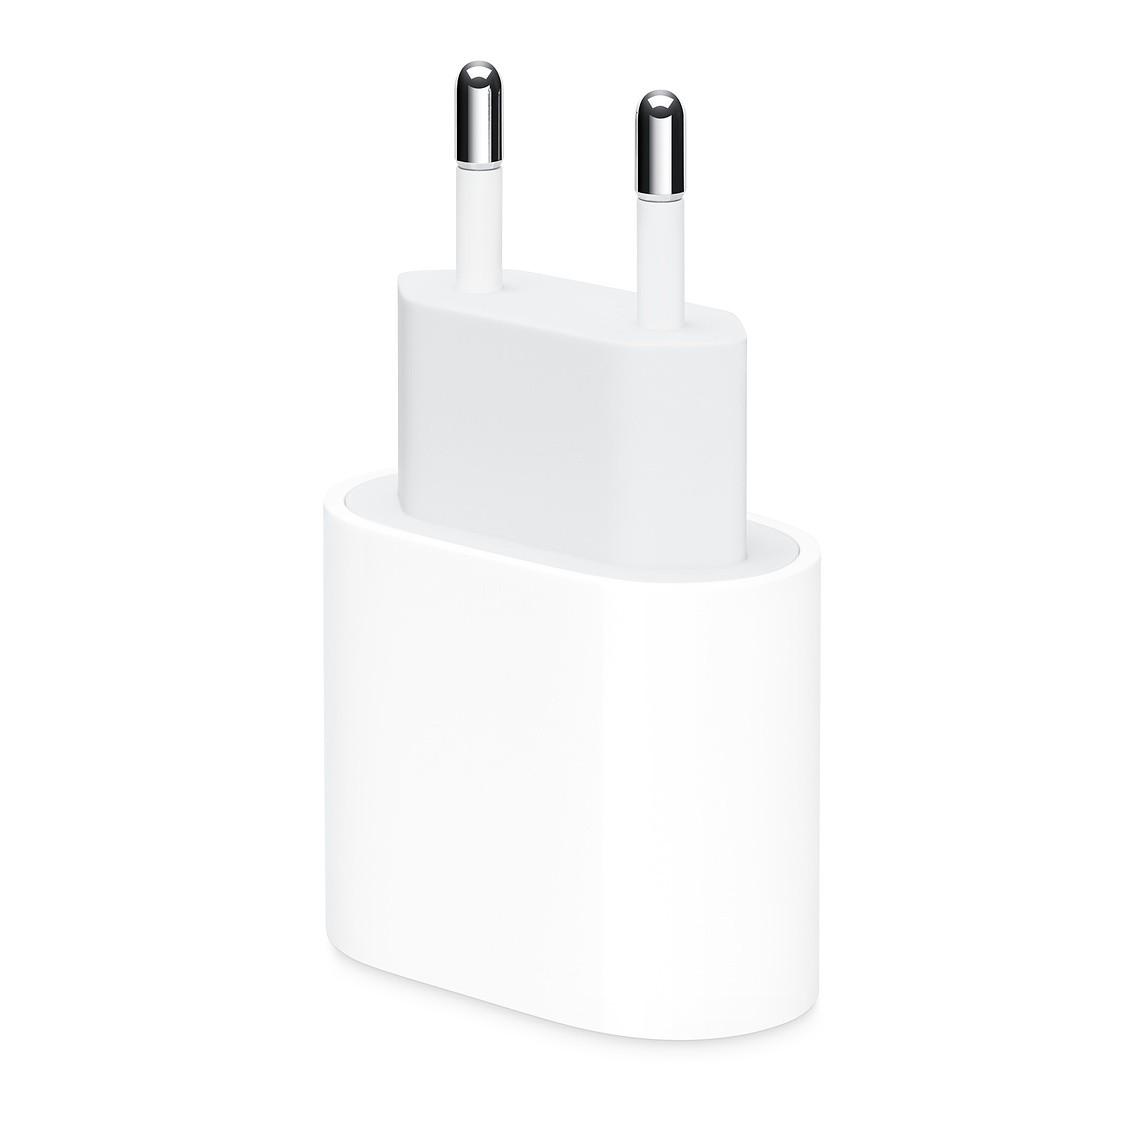 Fonte Original Apple USB-C de 20W